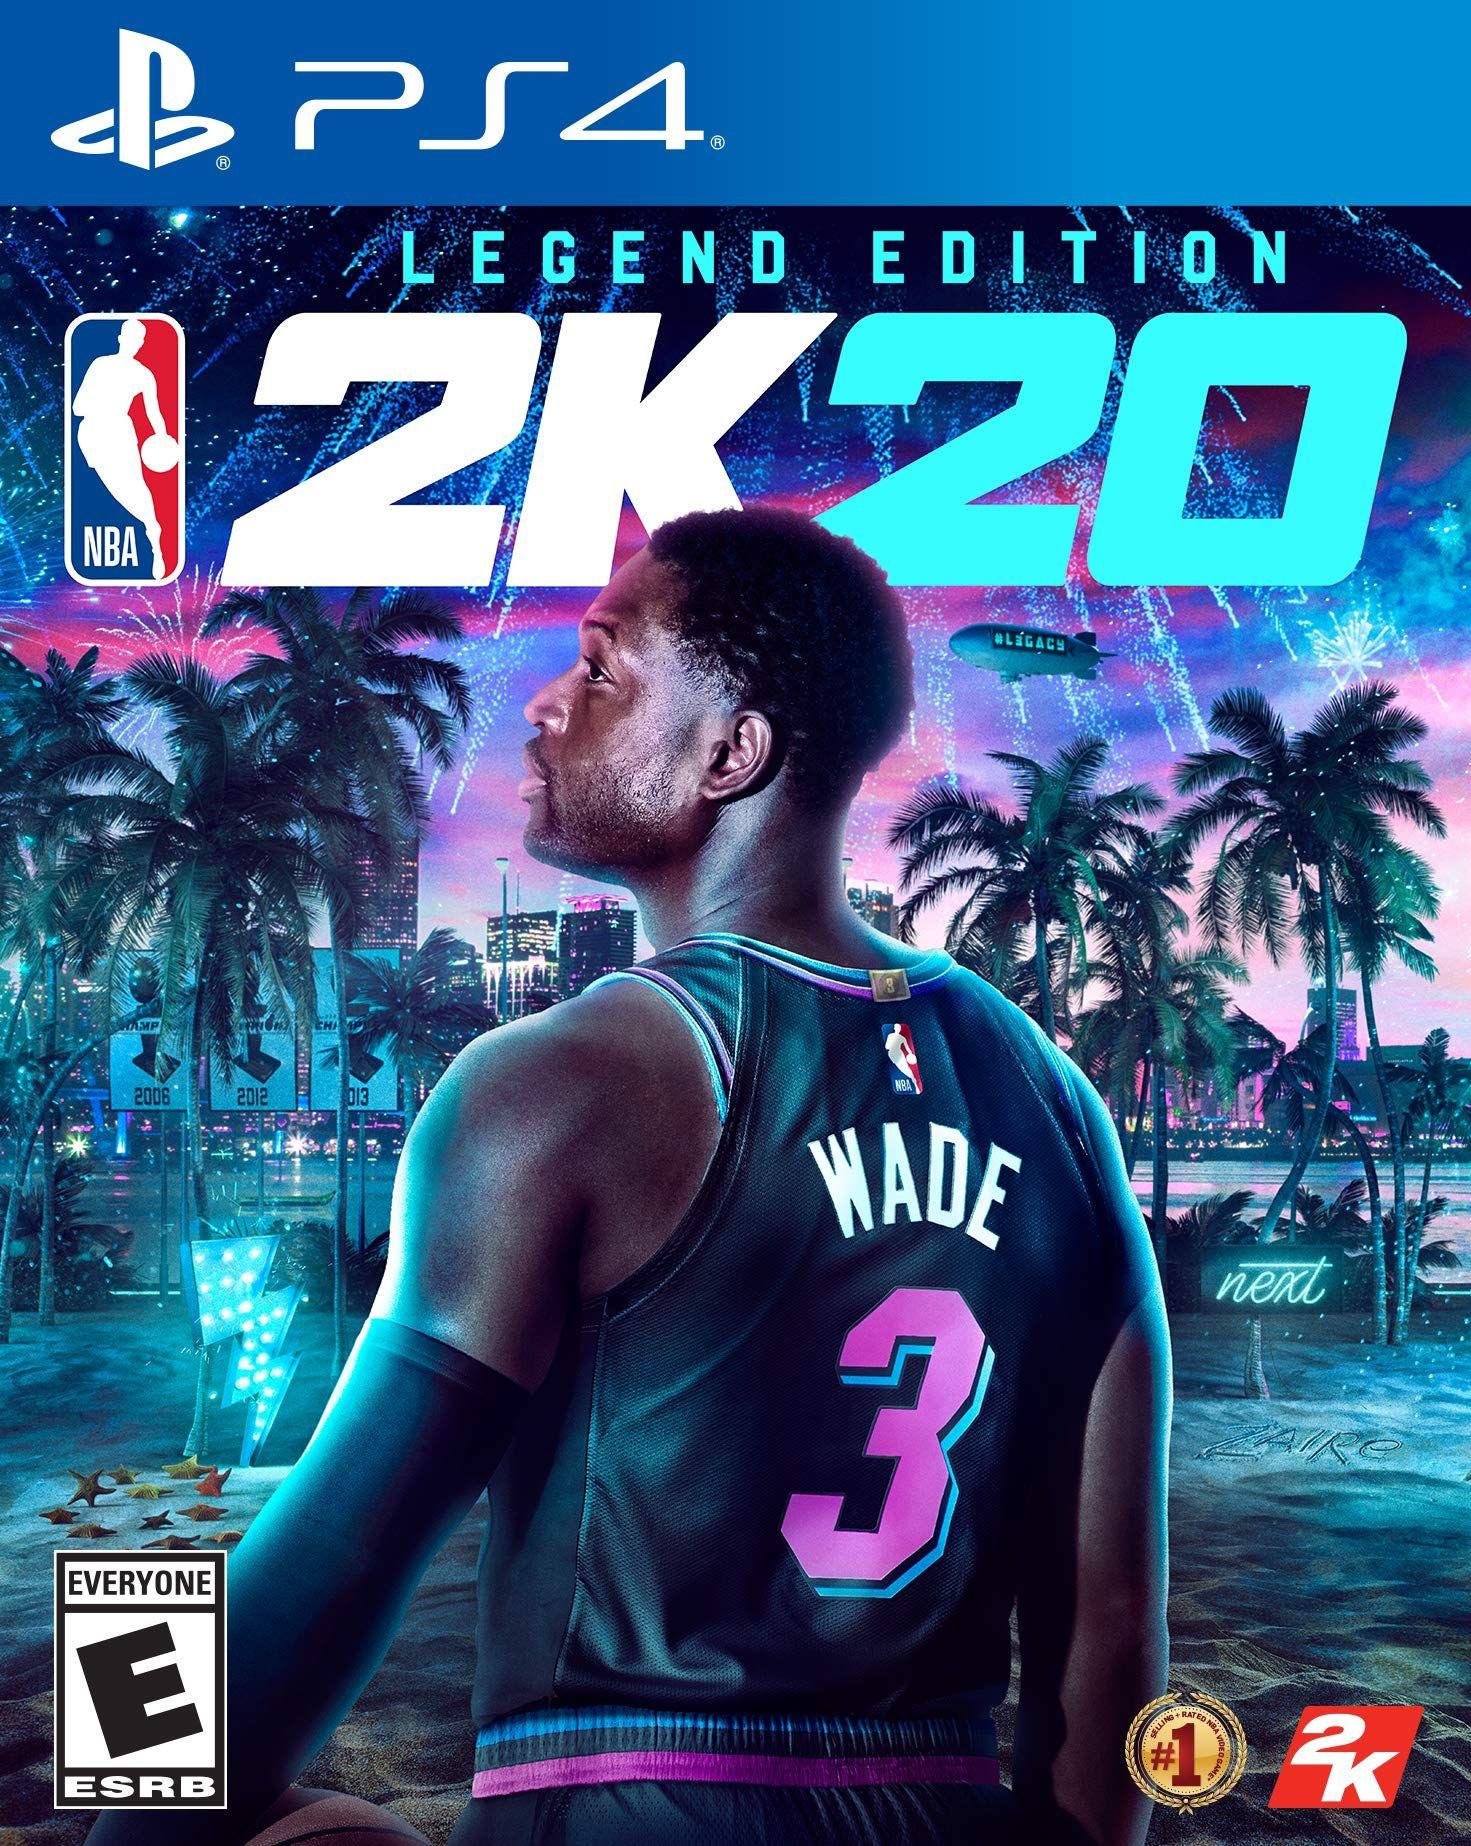 NBA 2K20 Legend Edition PlayStation 4 Ios games, Ps4